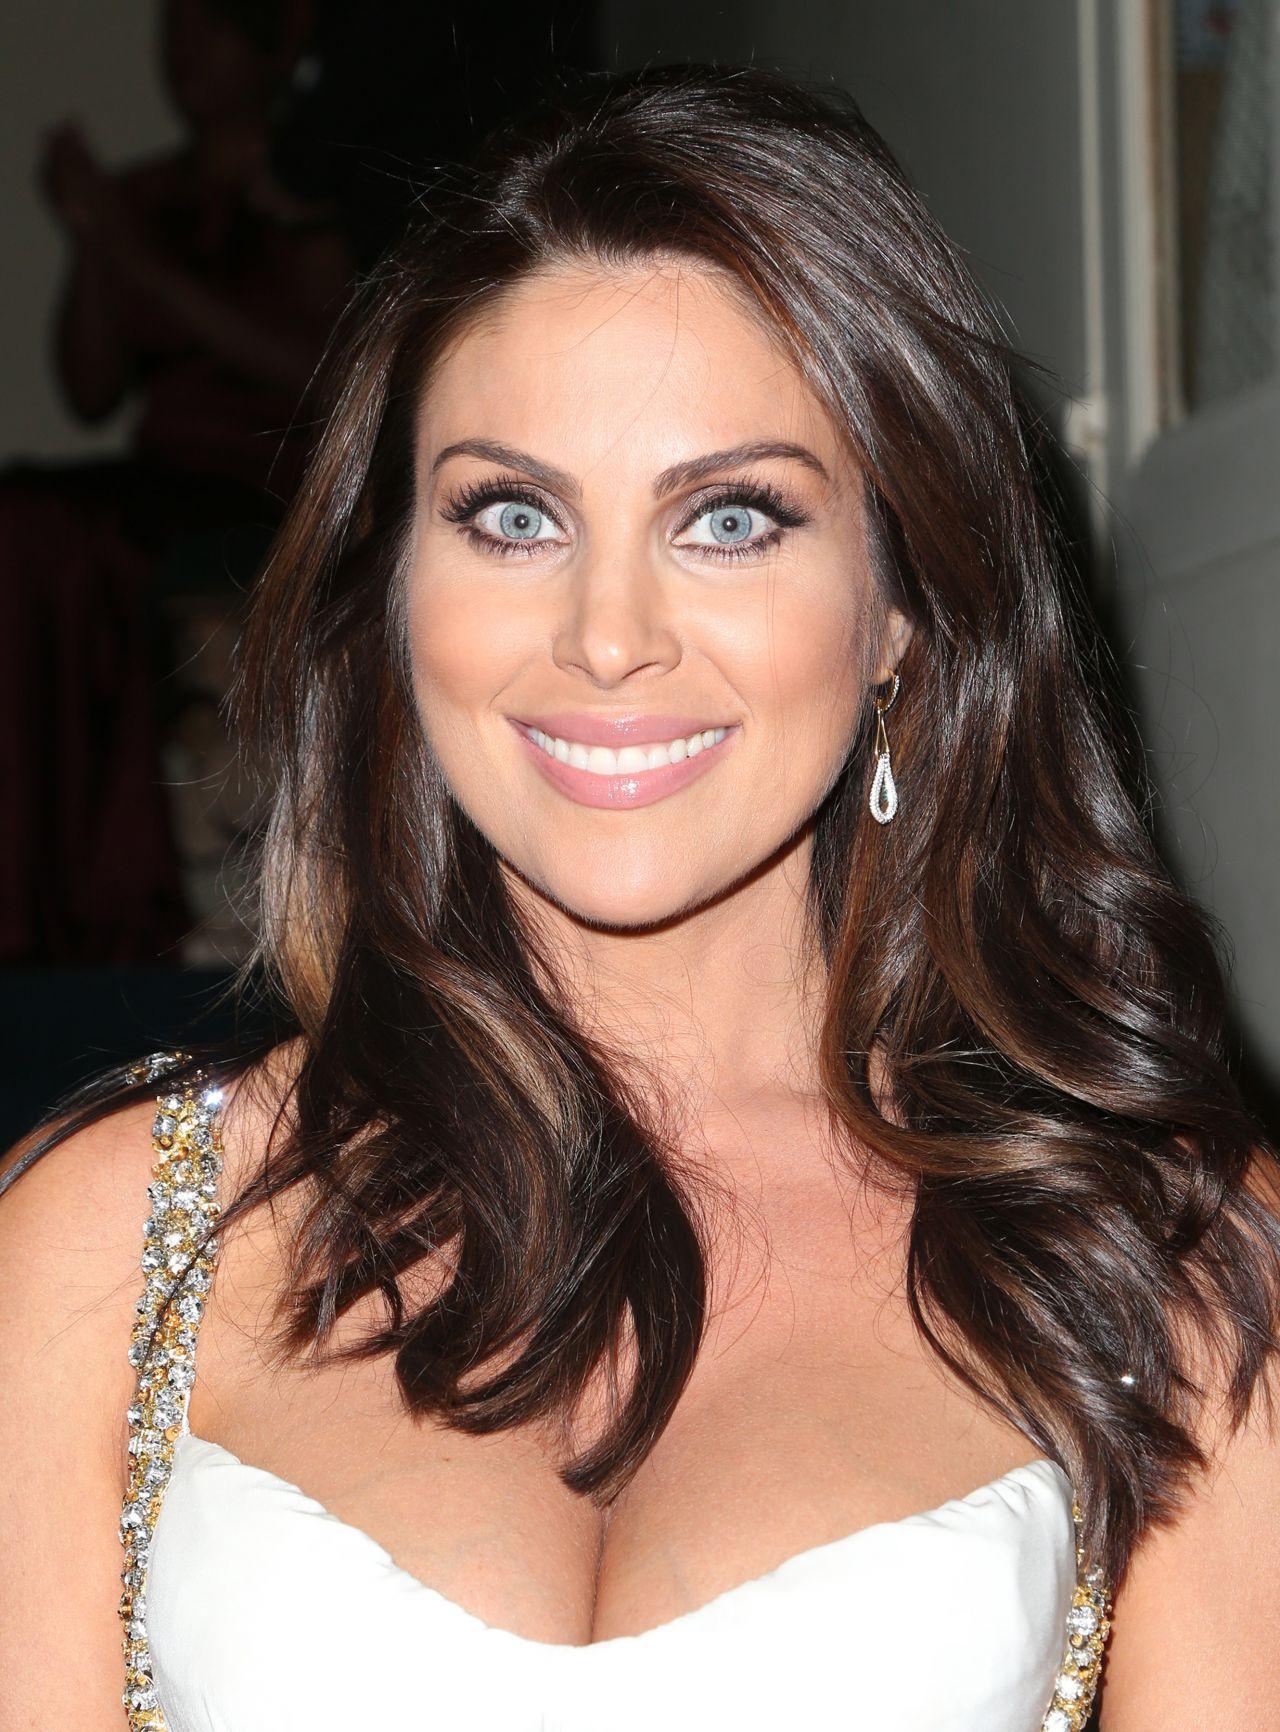 Nadia Bjorlin - Daytime Emmy Awards in Los Angeles 04/30